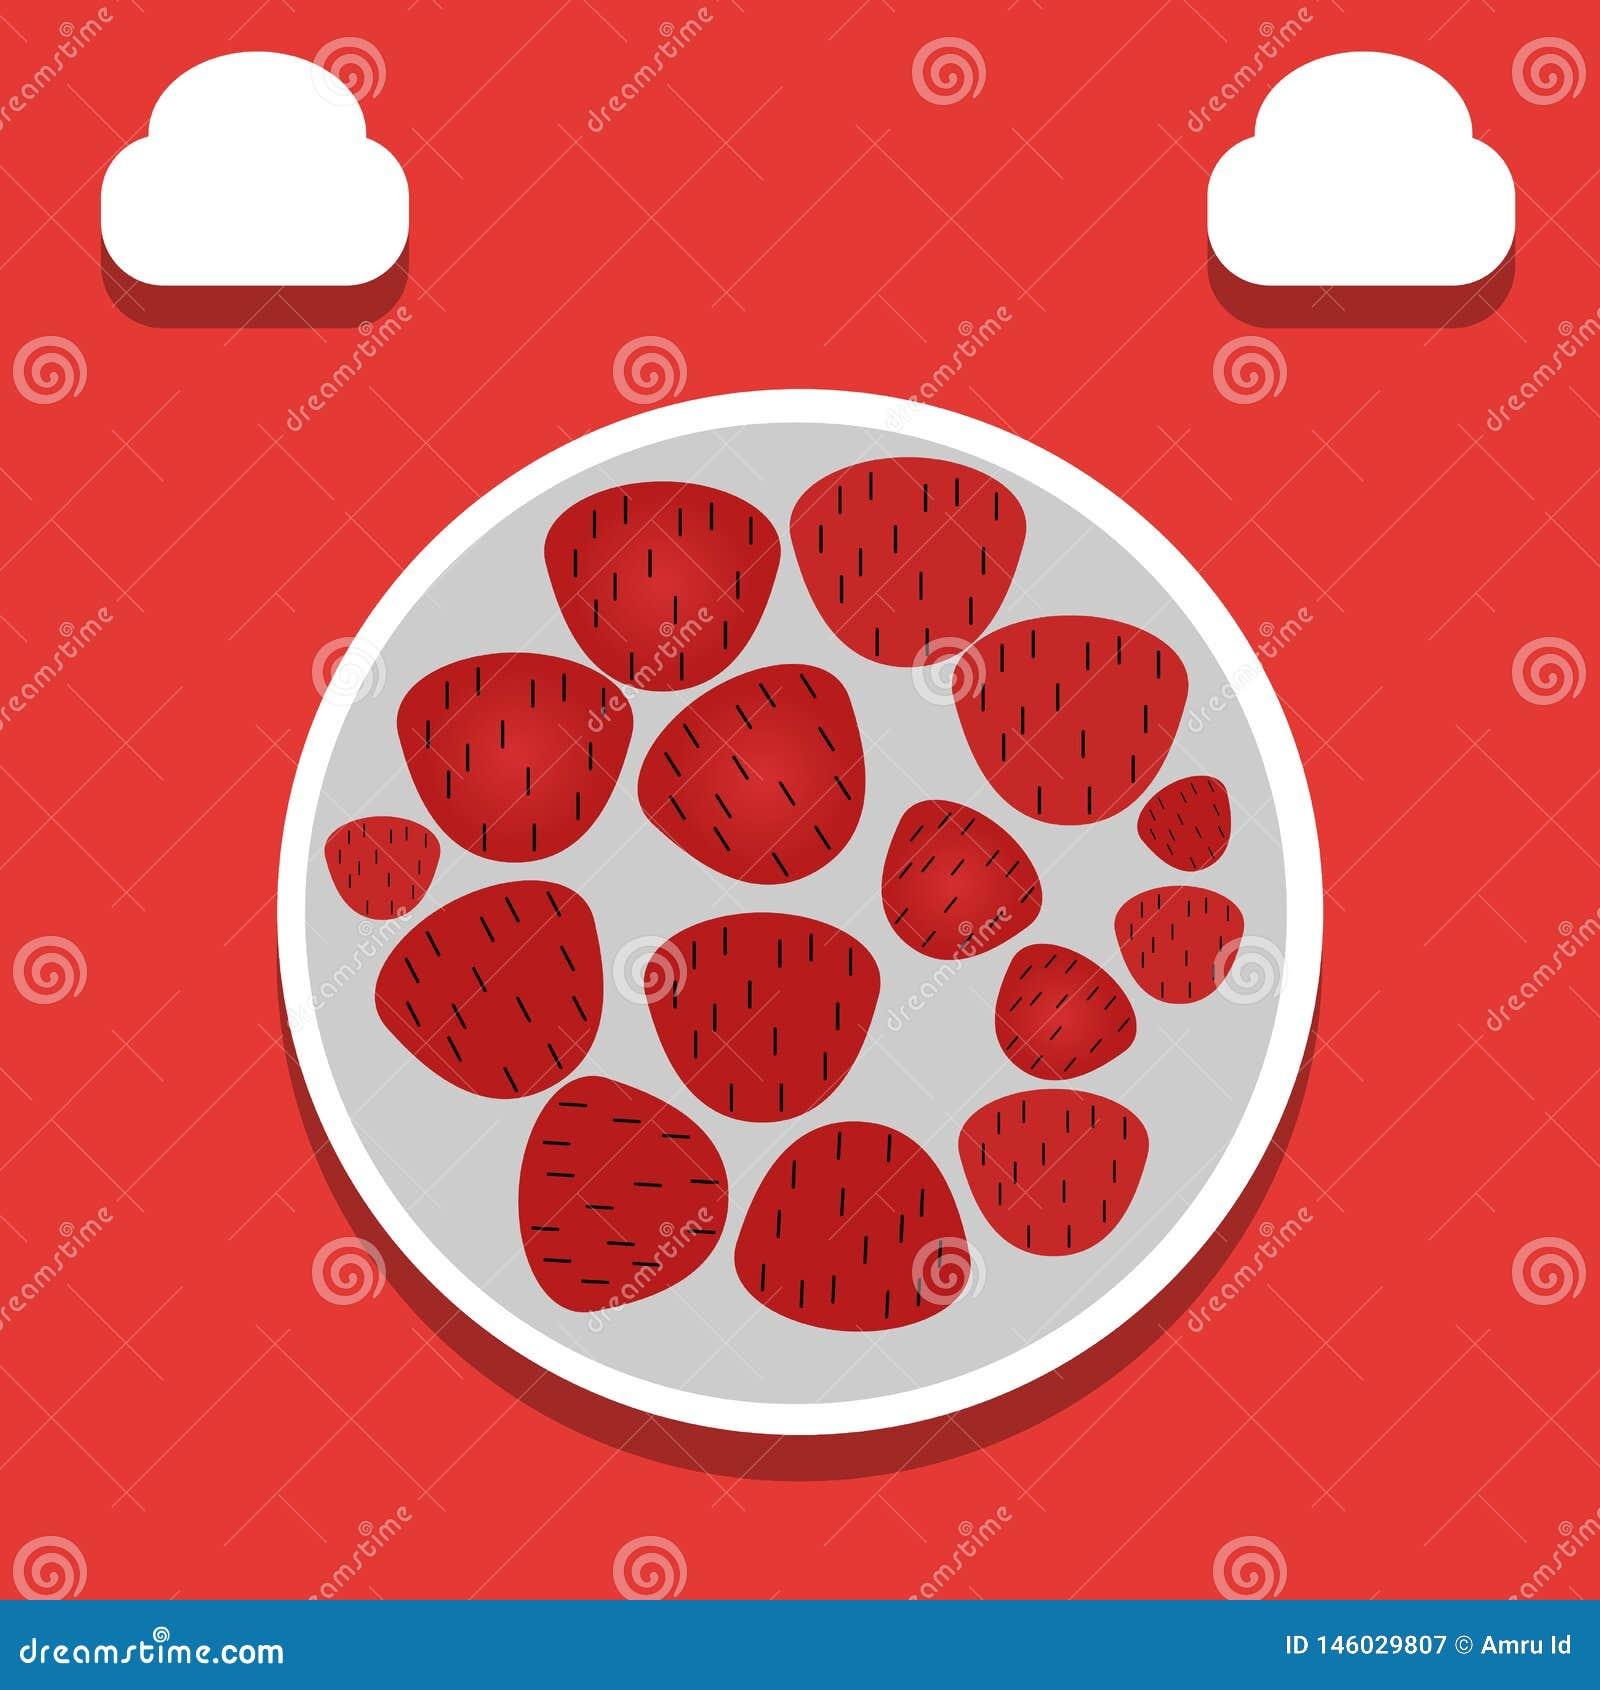 Strawberry illustration - vector